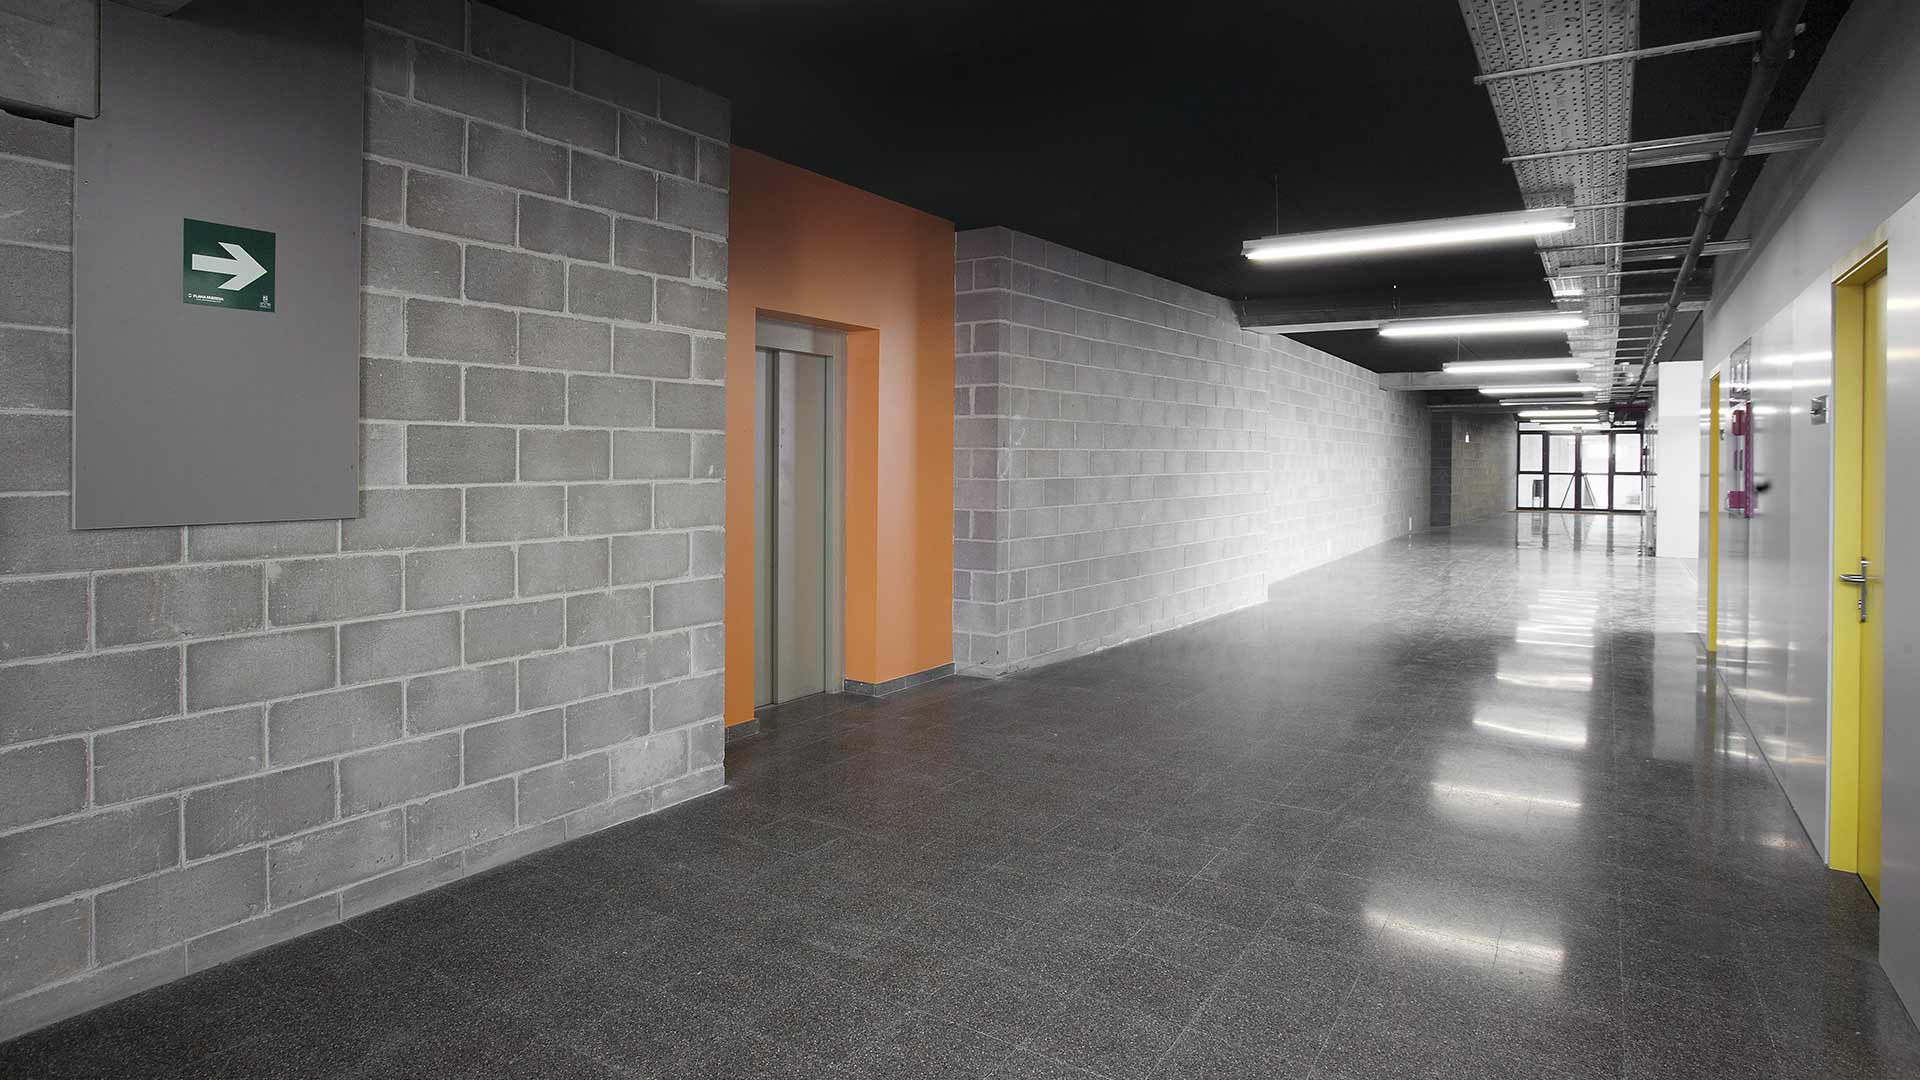 prefabricats-pujol-terratzo-paviment-escoles-montornes-4